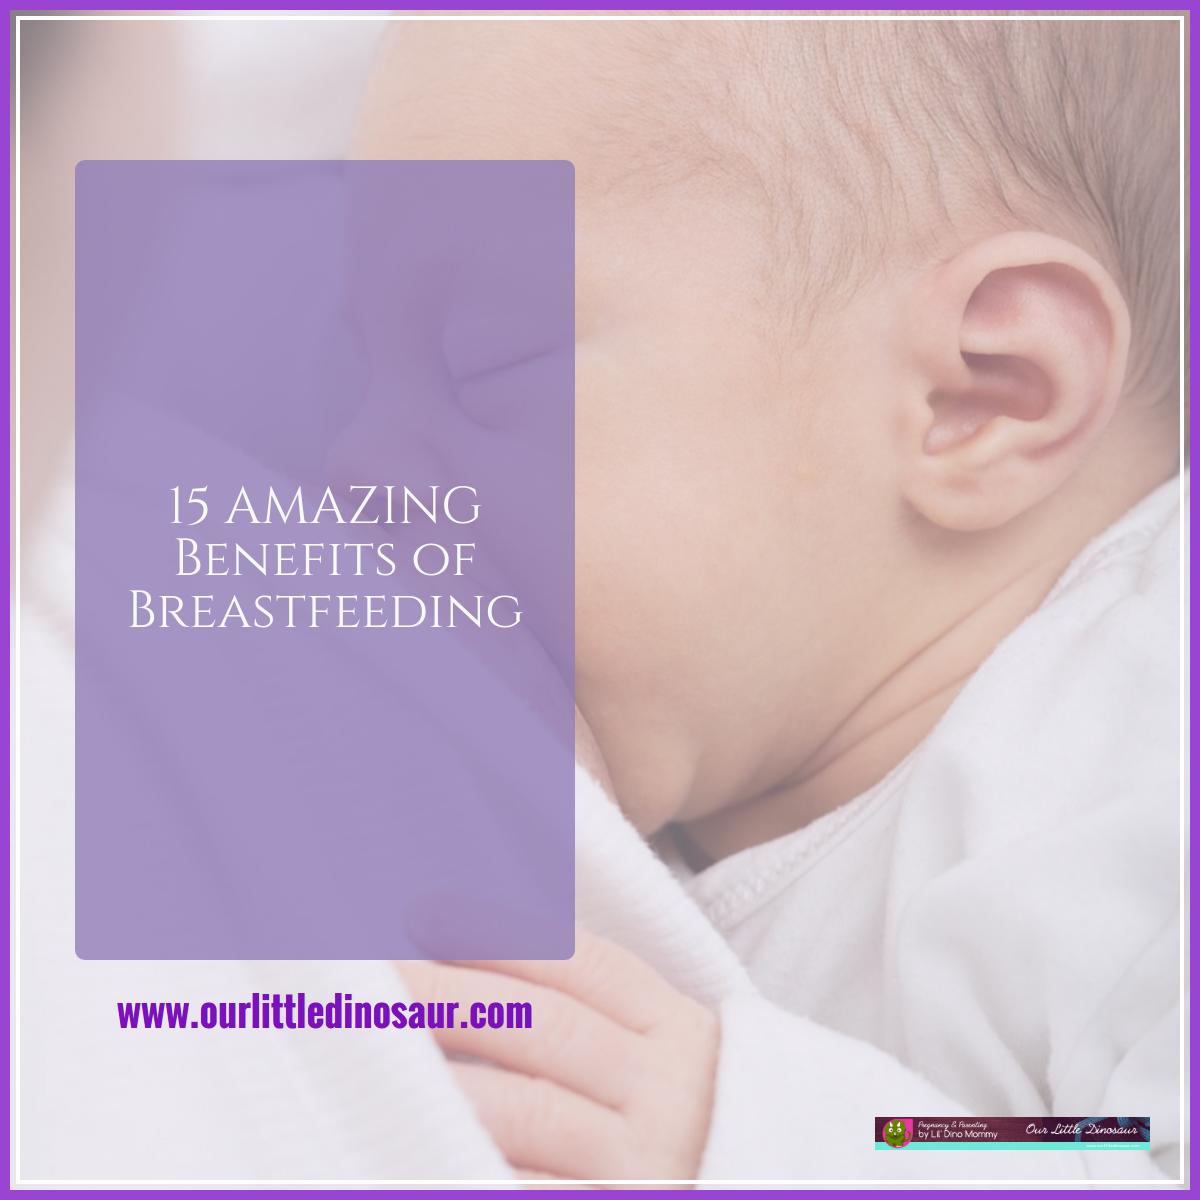 15 Amazing Benefits of Breastfeeding